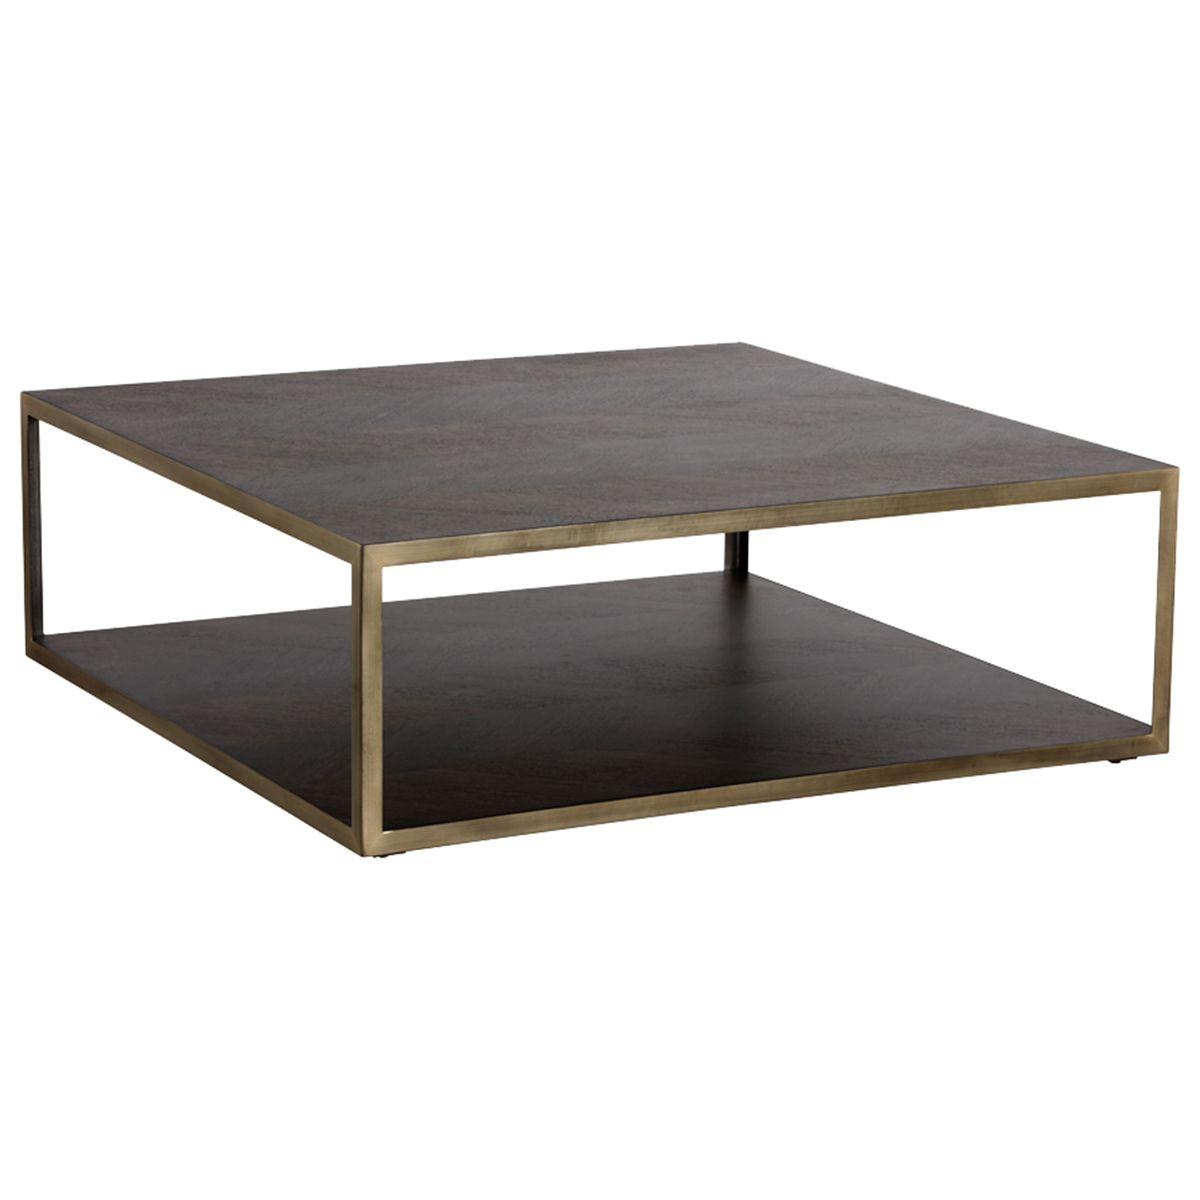 Zenn Mara Square Coffee Table Coffee Table Coffee Table Square